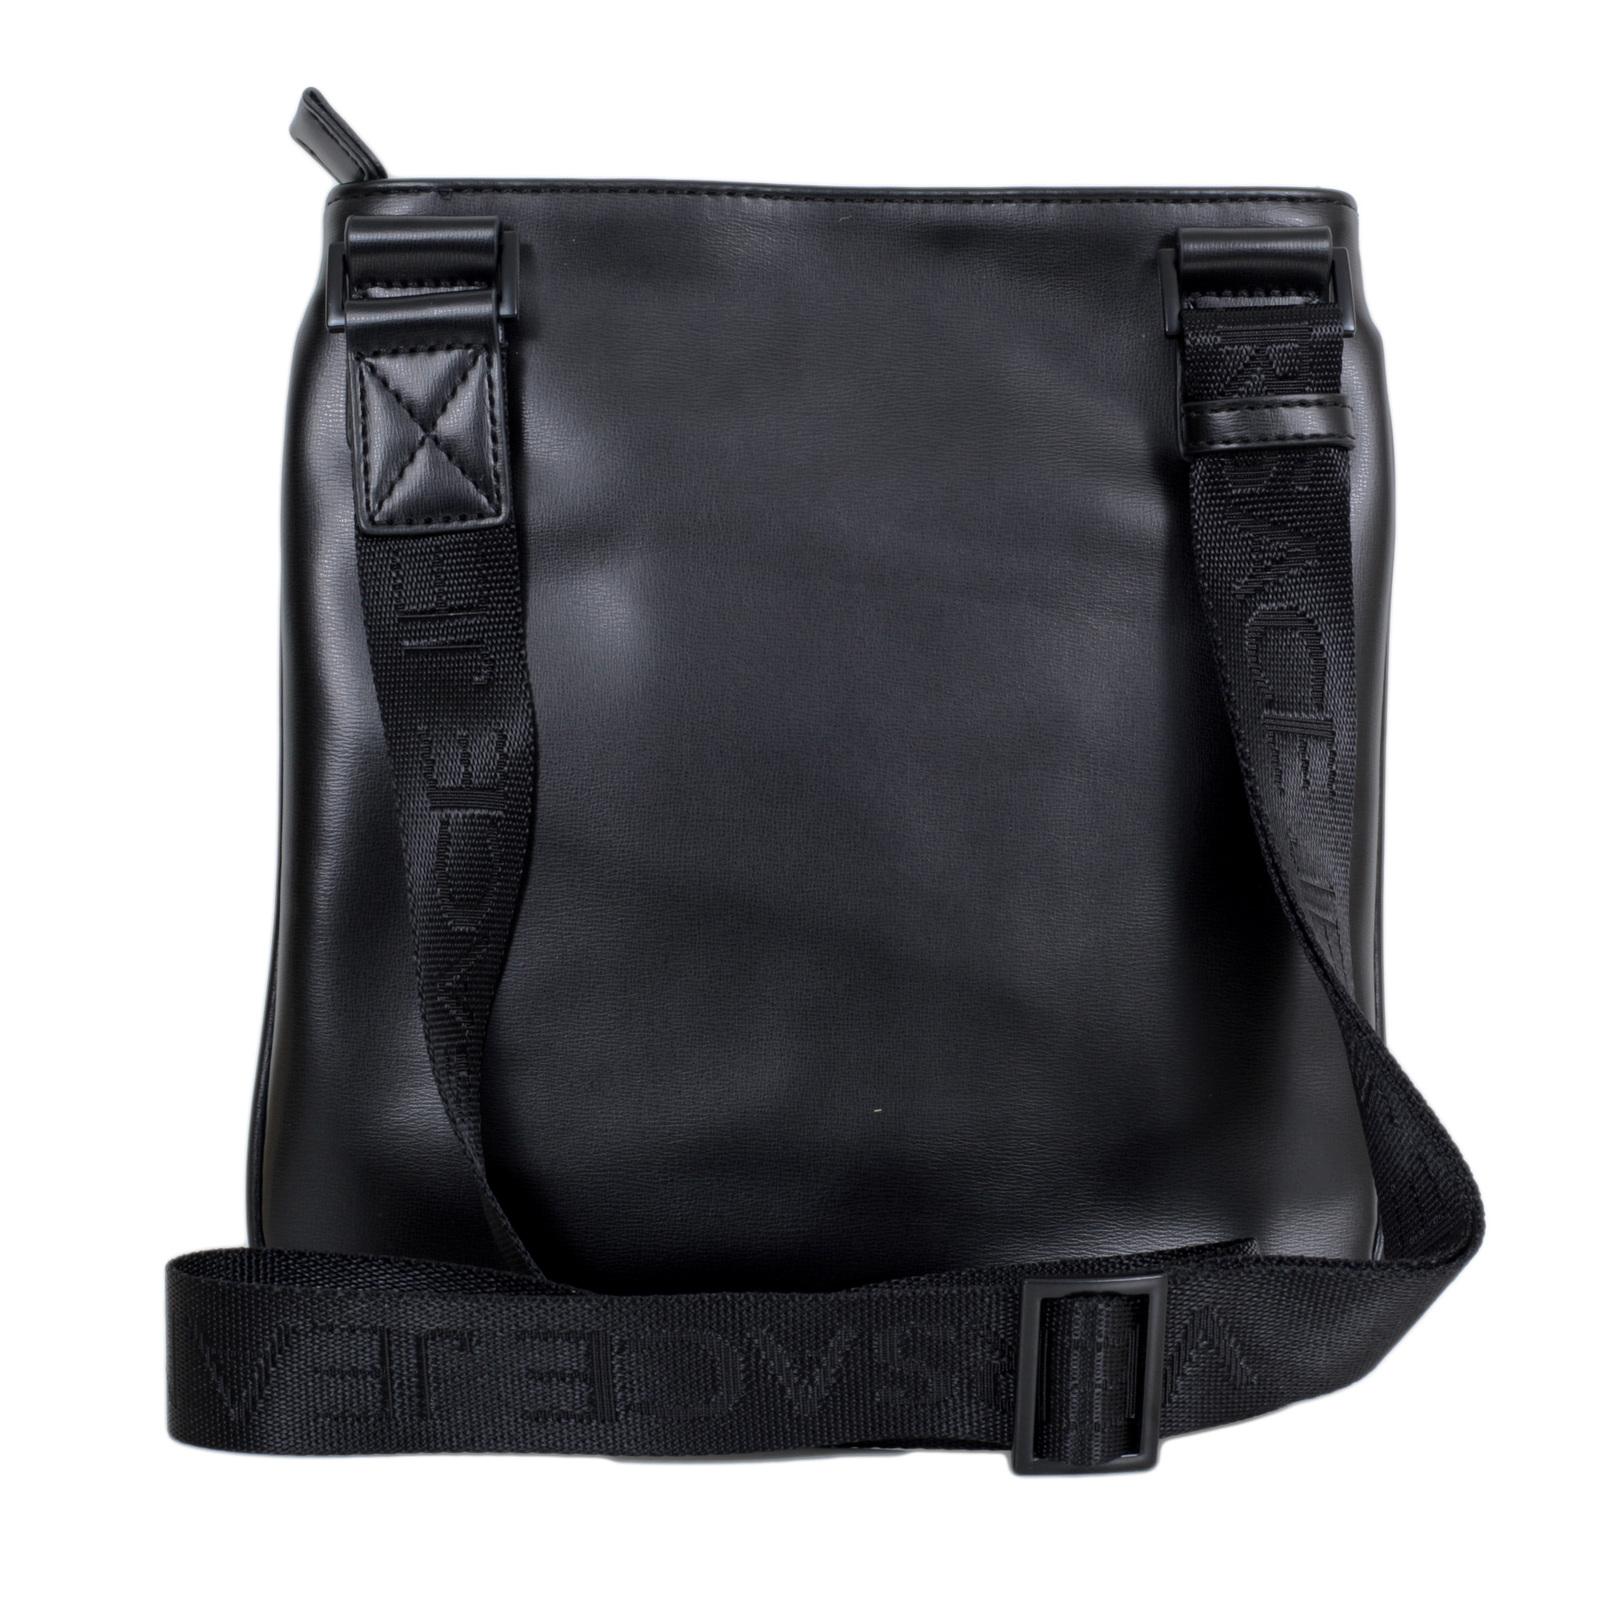 7e3ede46 Versace Jeans Nastro Logato E1YOBB32 Top Zip Closure Black Bag with Logo  Front Panel and Pocket VJCM6702